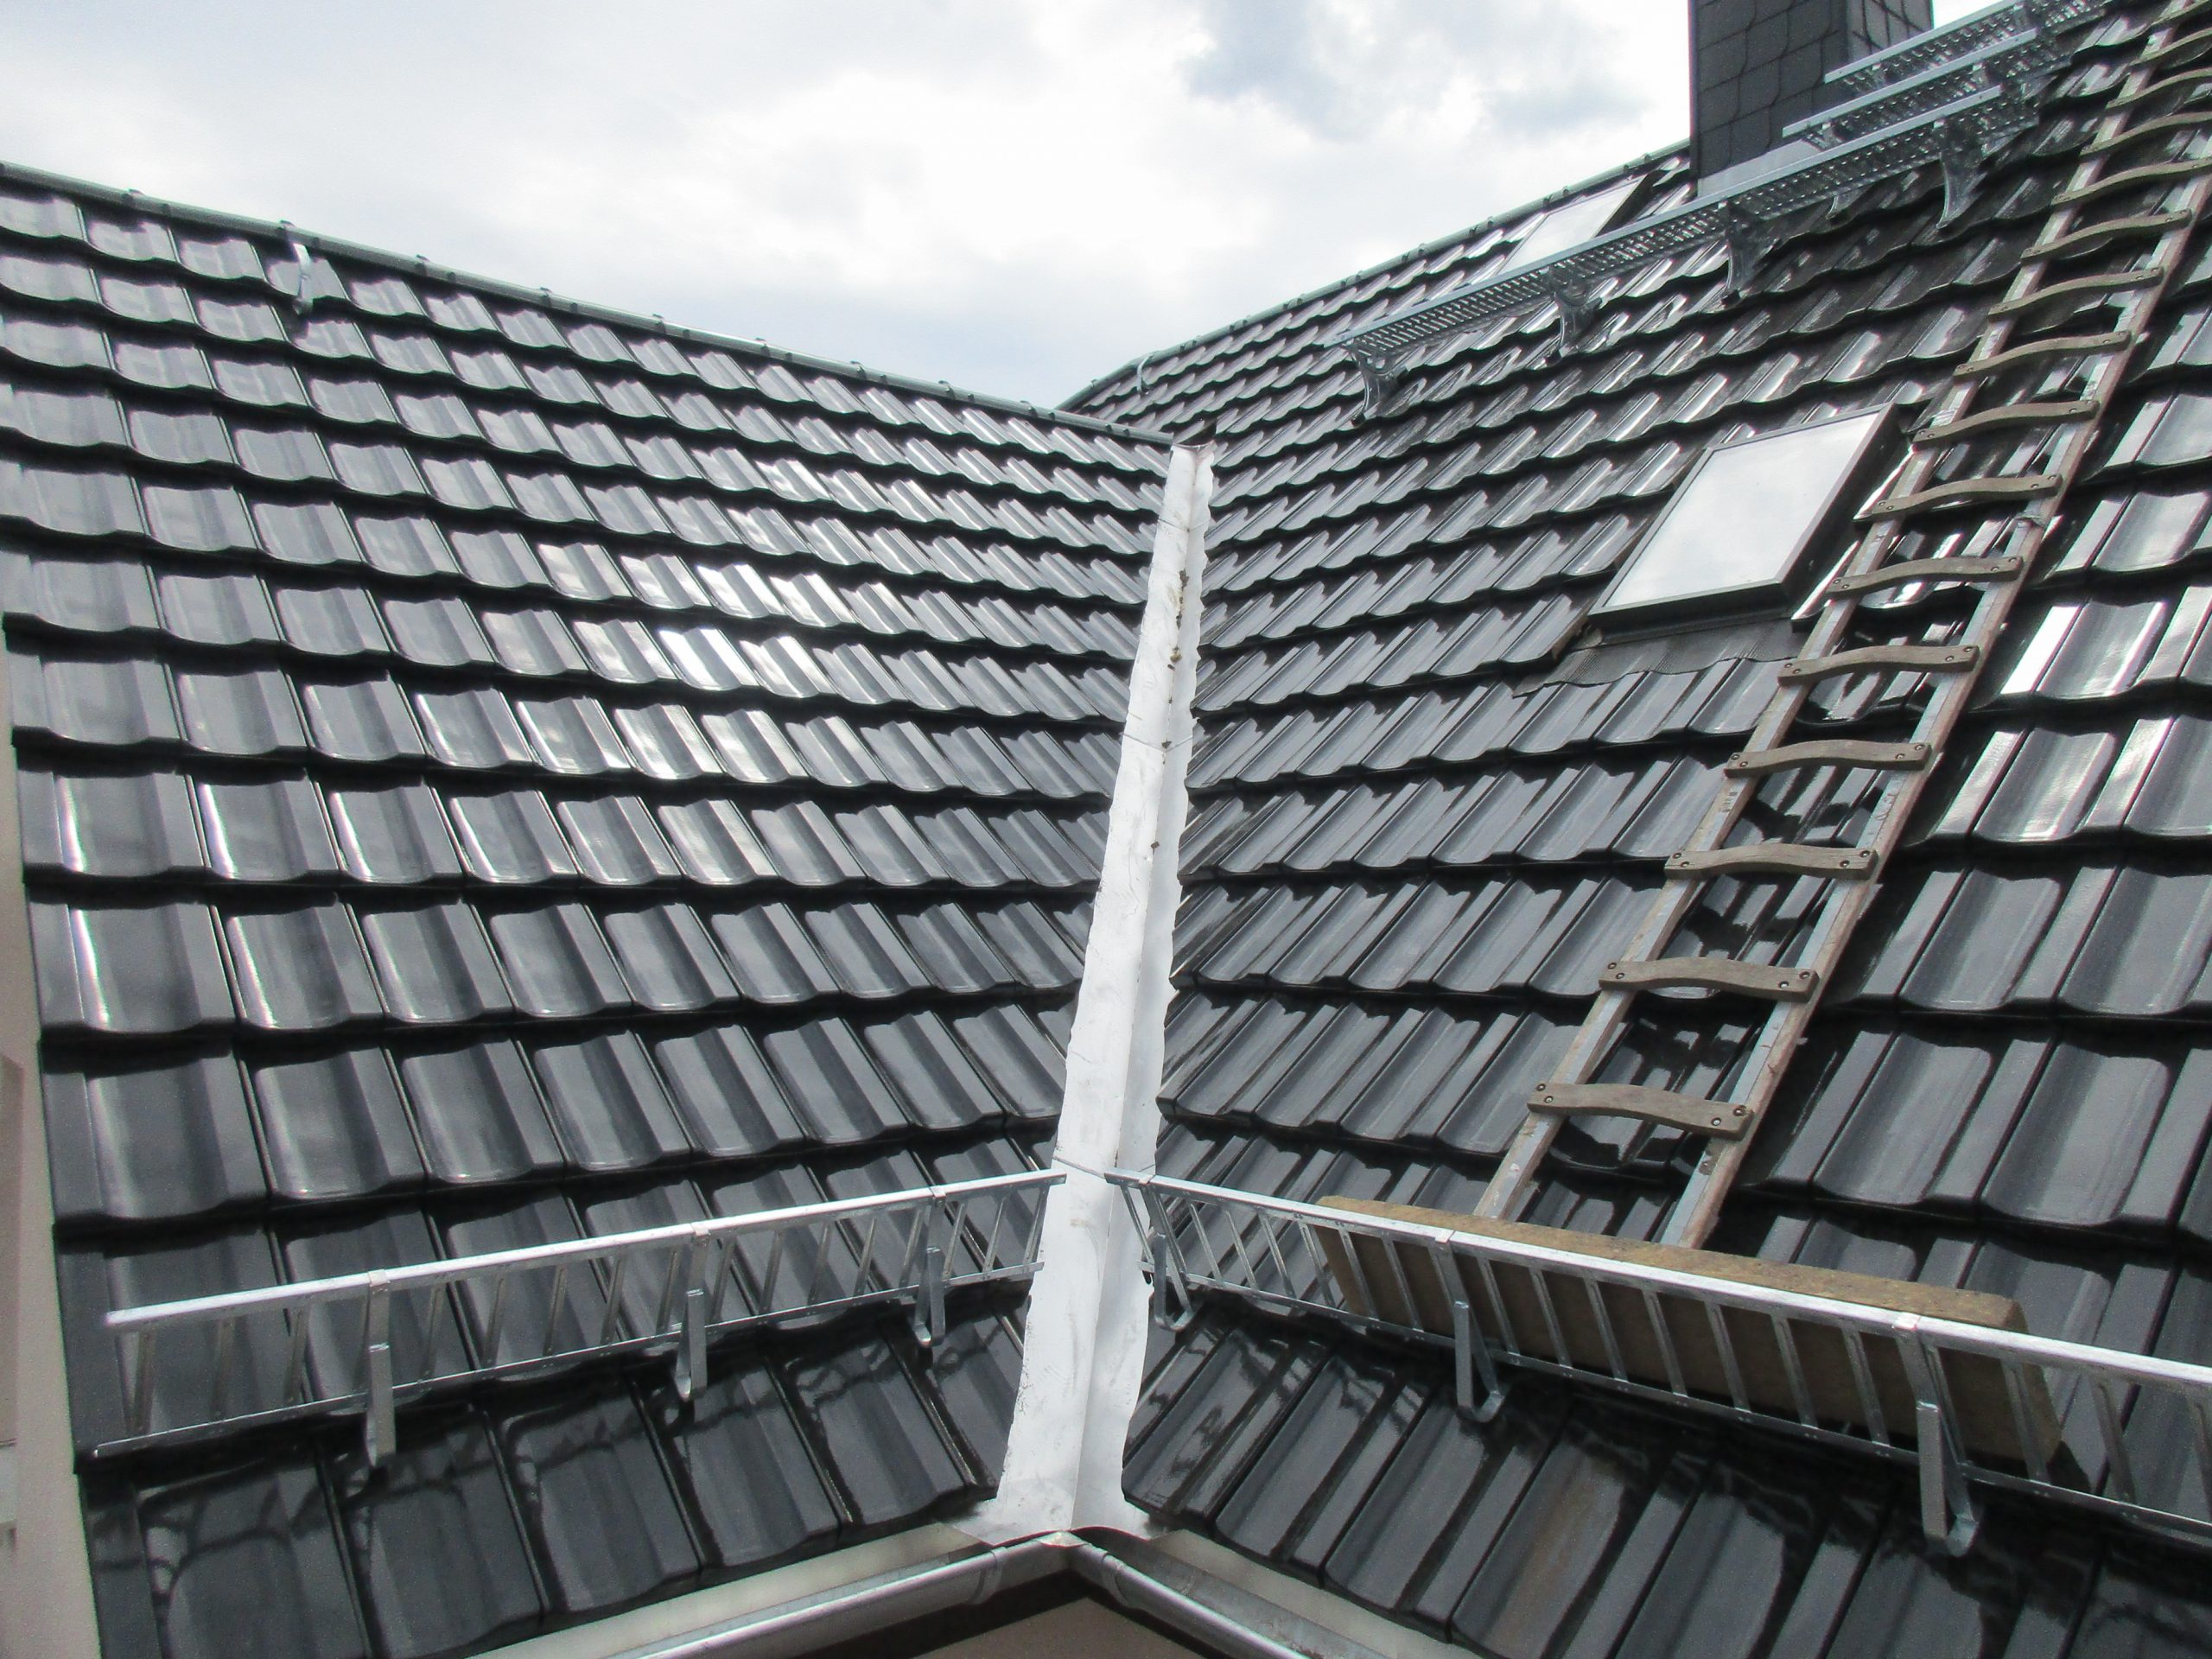 Dach umbauen